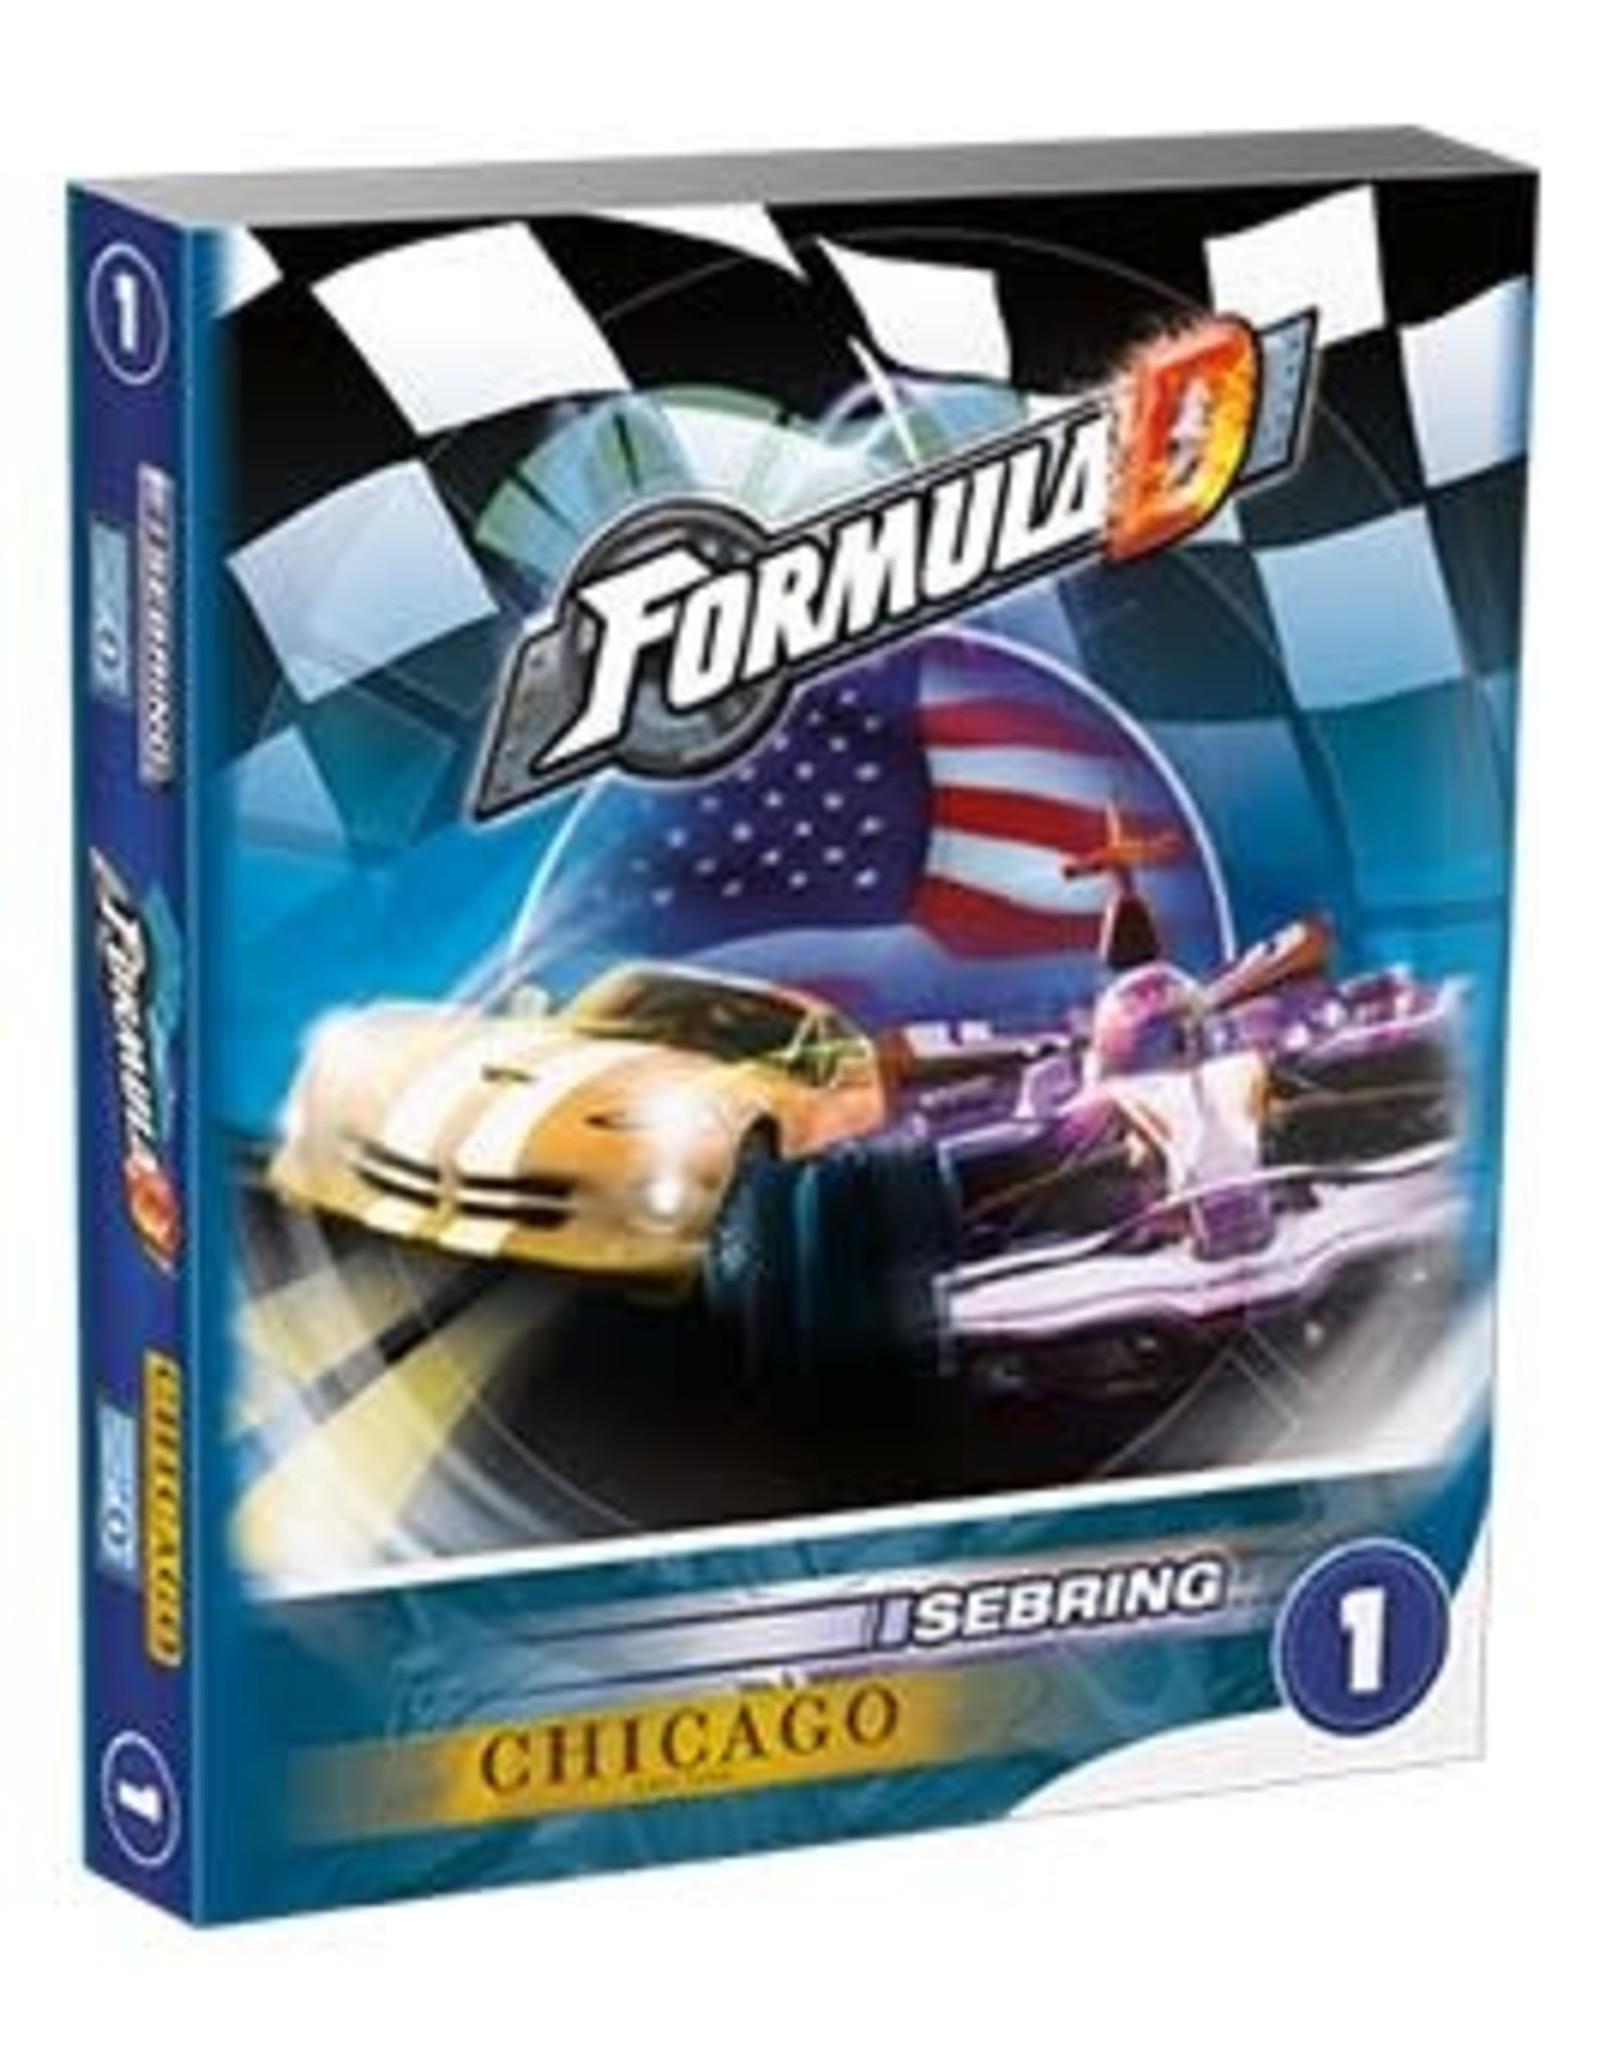 Zygomatic Formula D: #1 Chicago/Sebring